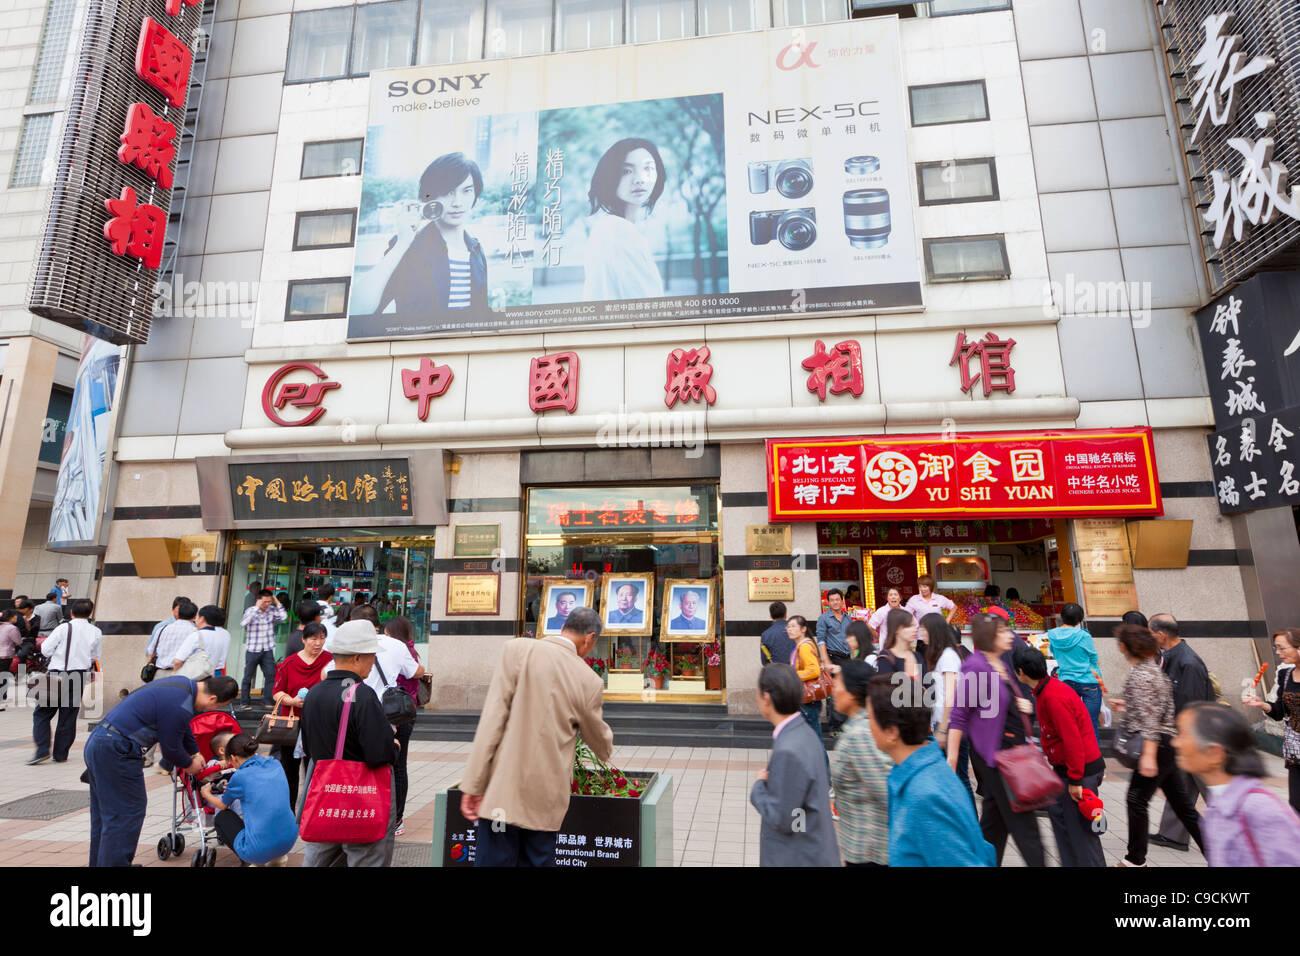 Shoppers and tourists on Wangfujing shopping street Beijing, PRC, People's Republic of China, Asia - Stock Image